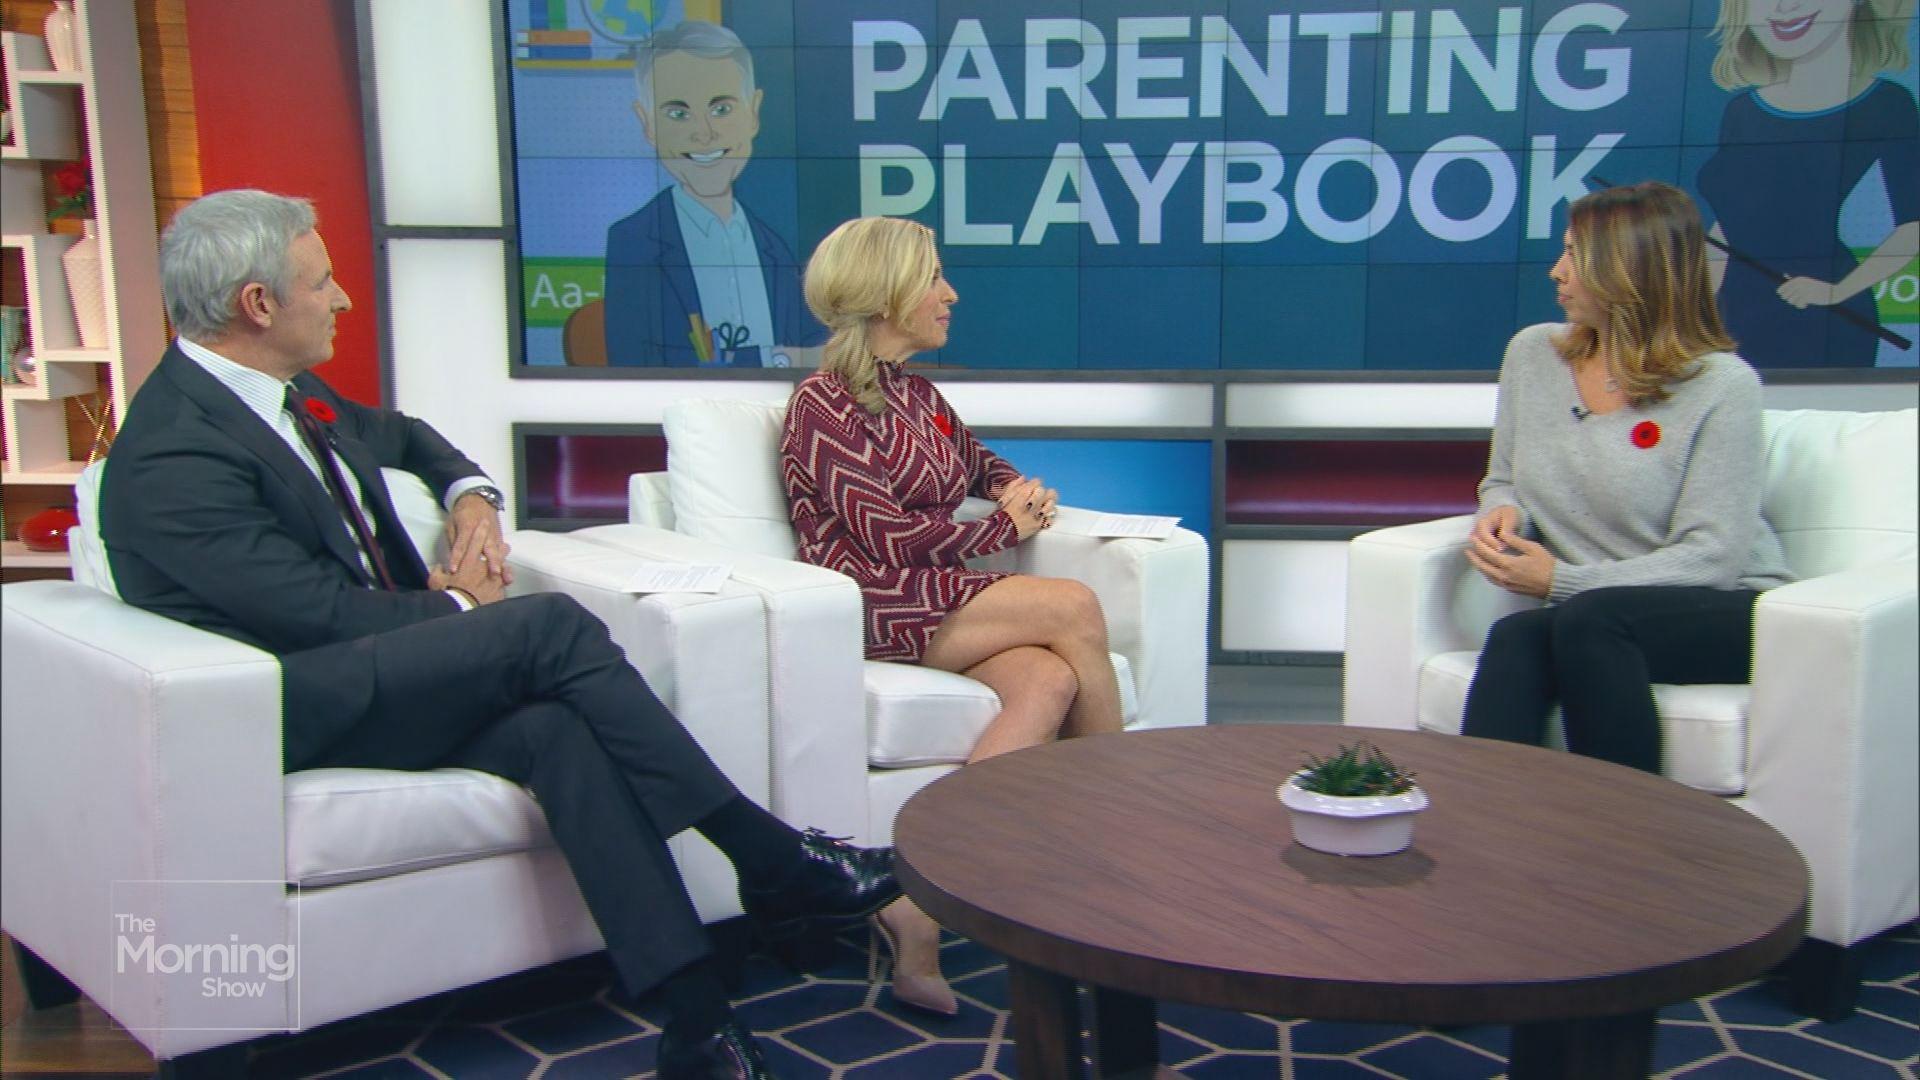 Parenting Playbook: Hygiene for tweens and teens